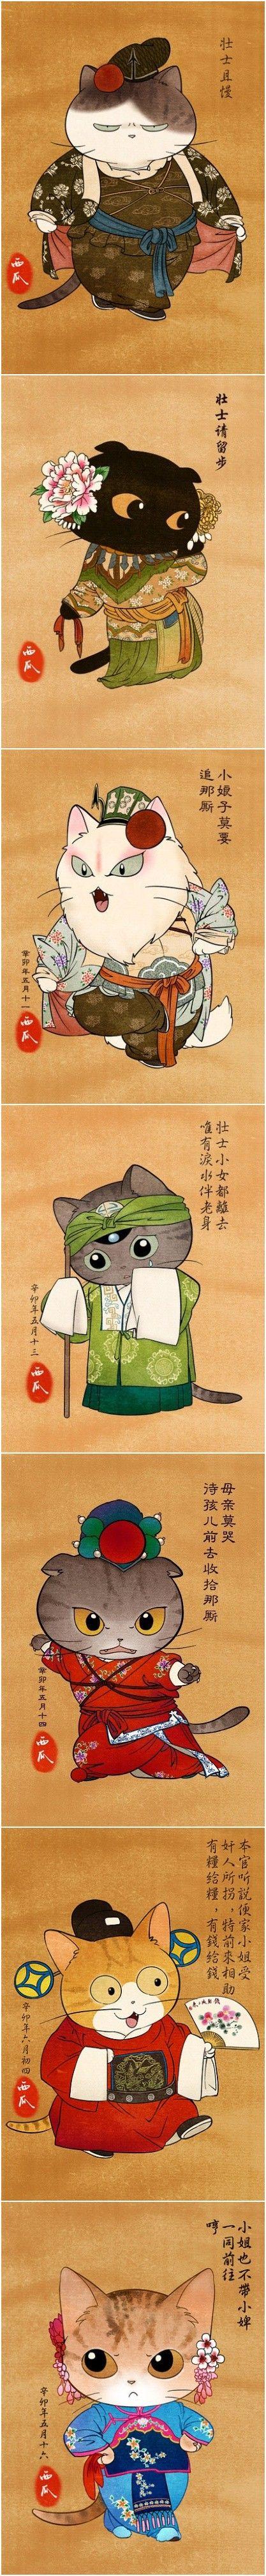 Neko chan (endearing term for cat)                                                                                                                                                                                 Plus